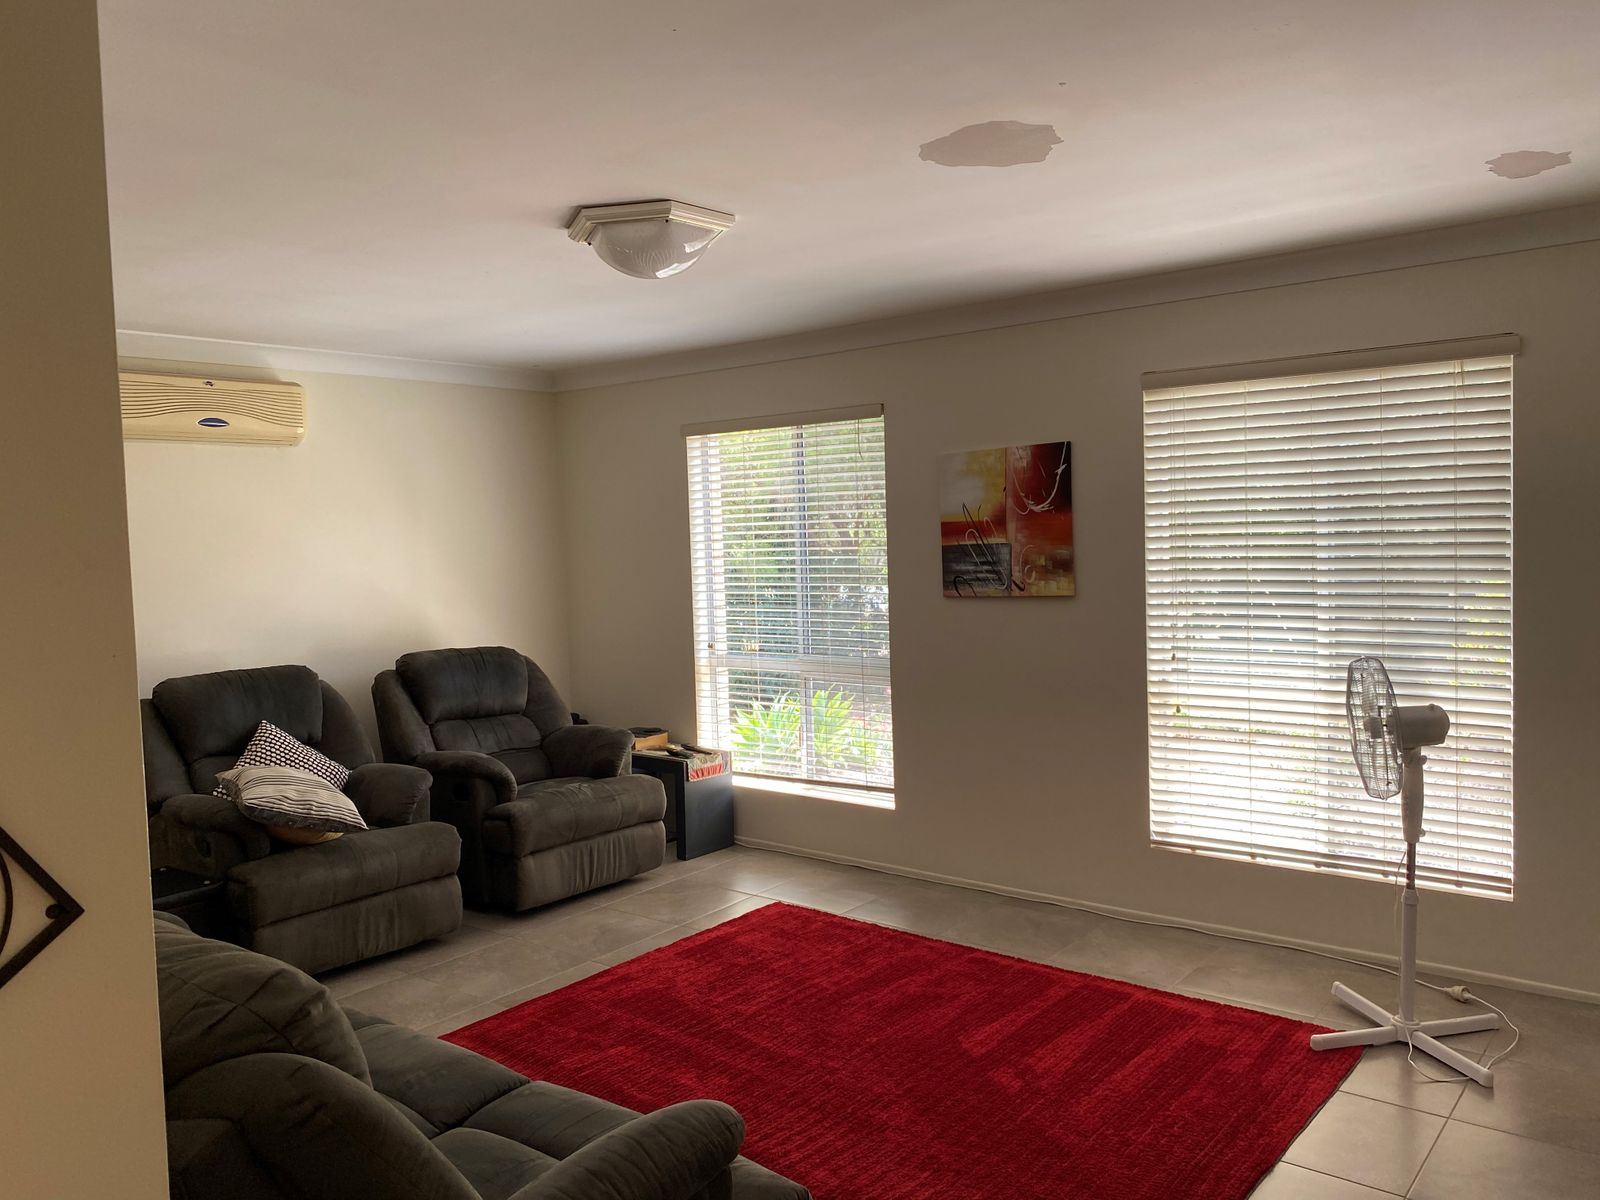 255 Avondale Road, Avondale, QLD 4670